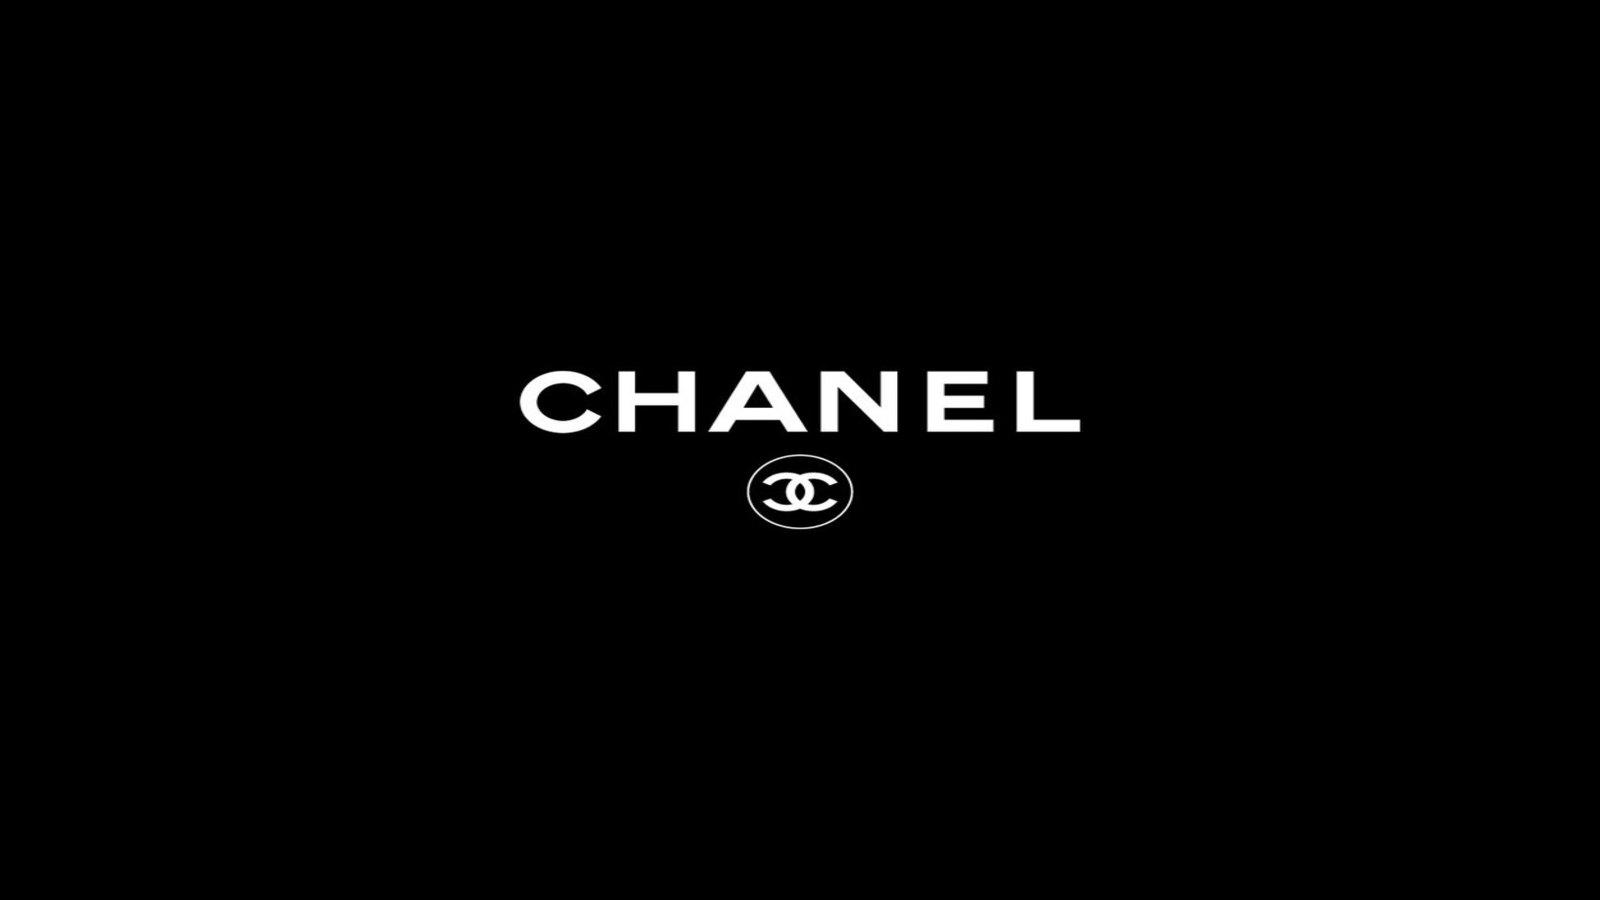 Chanel Computer Wallpapers Desktop Backgrounds 1600x900 ID436328 1600x900